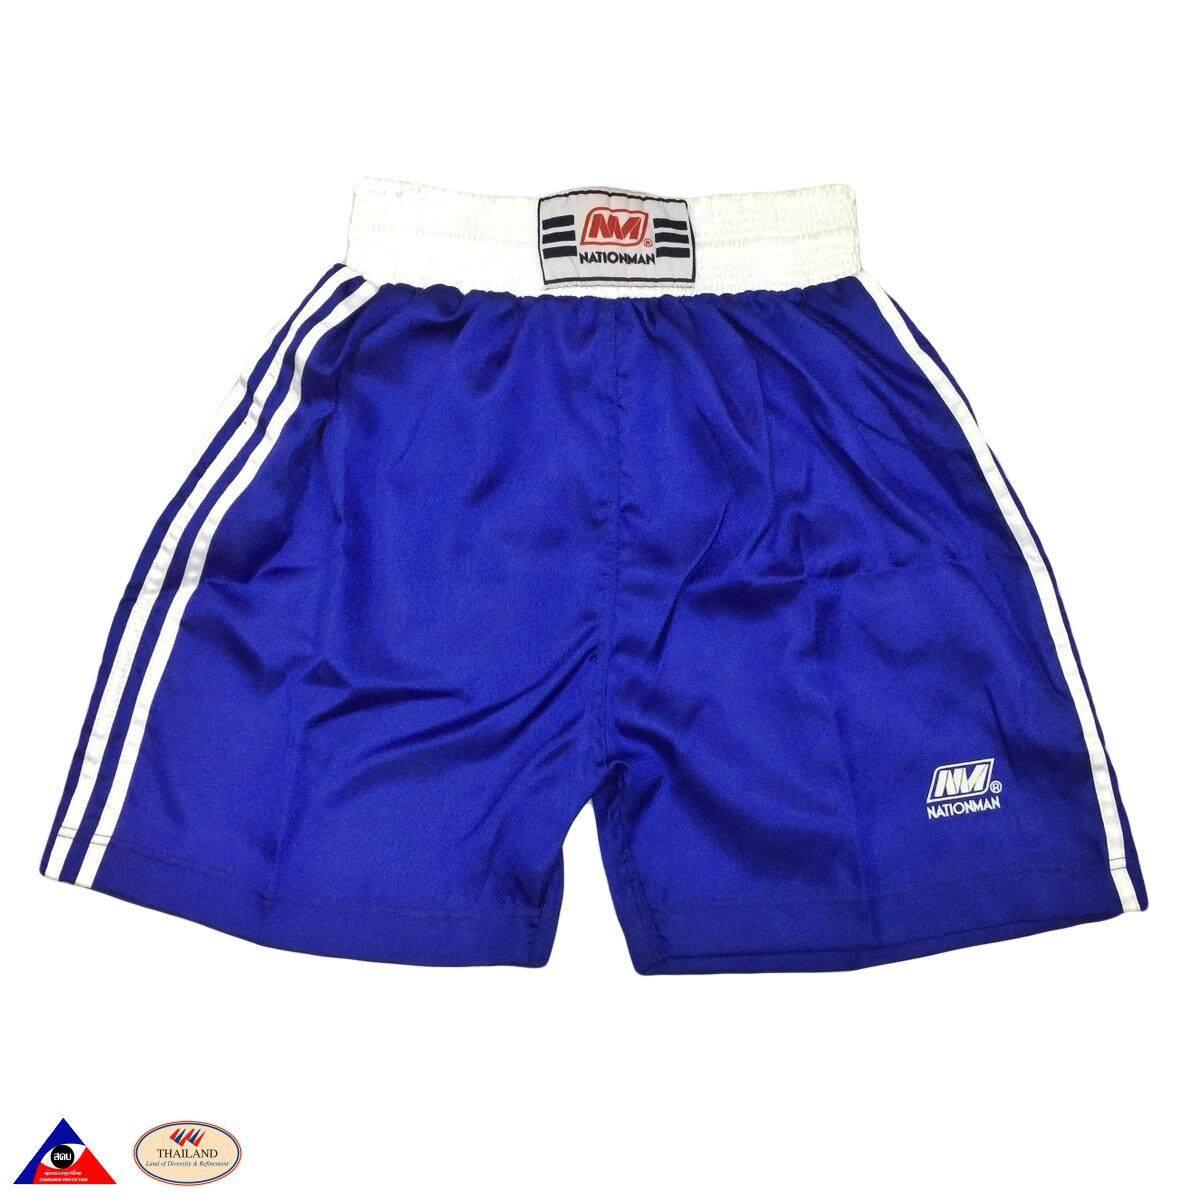 NATIONMAN Muay Thai Kick Boxing MMA Shorts Trunks Satin Blue S-3L